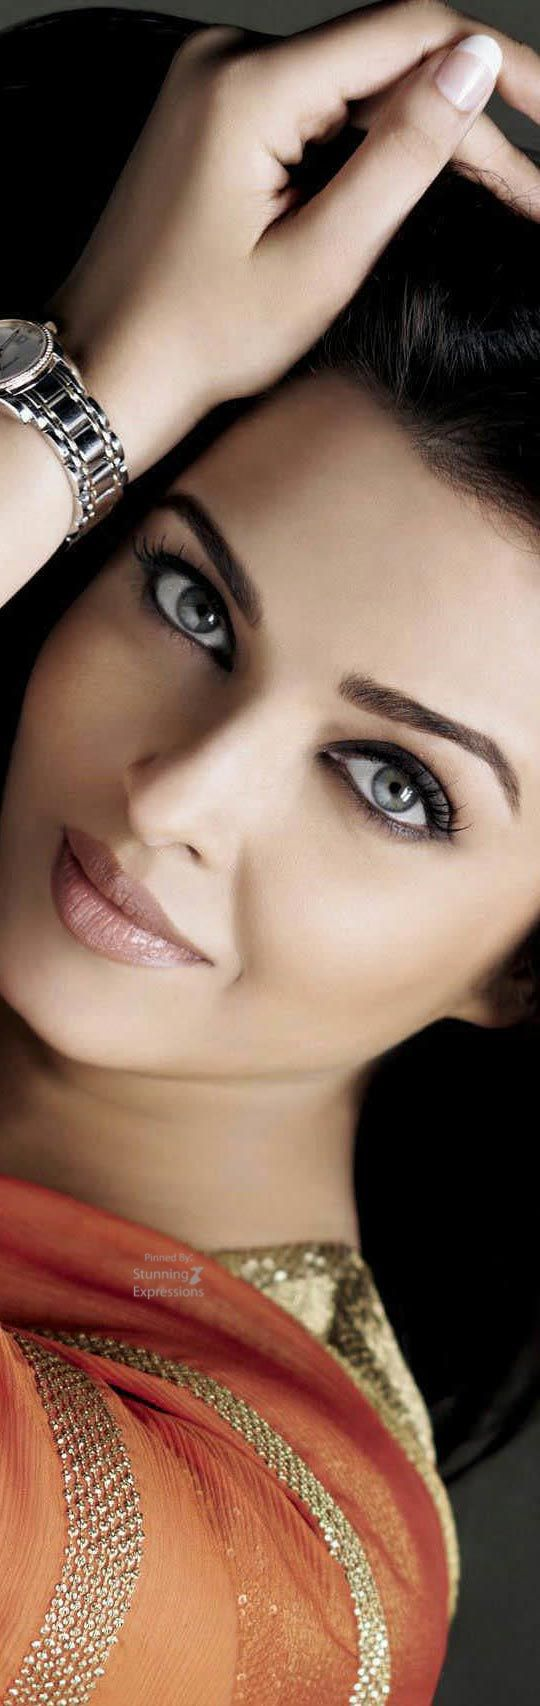 Aishwara Rai Bachchan